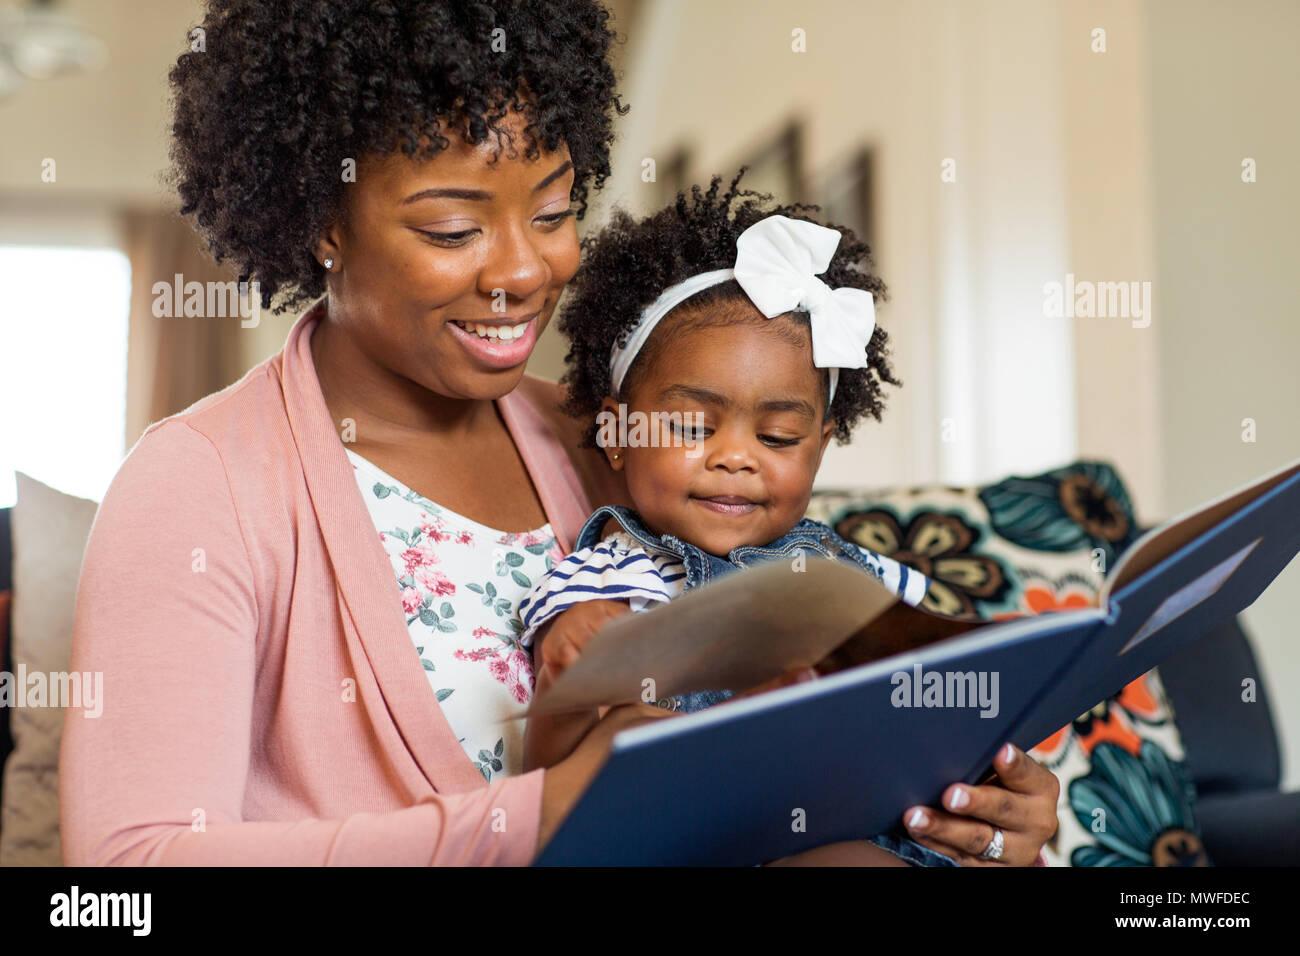 Madre leyendo un libro a su niña. Imagen De Stock